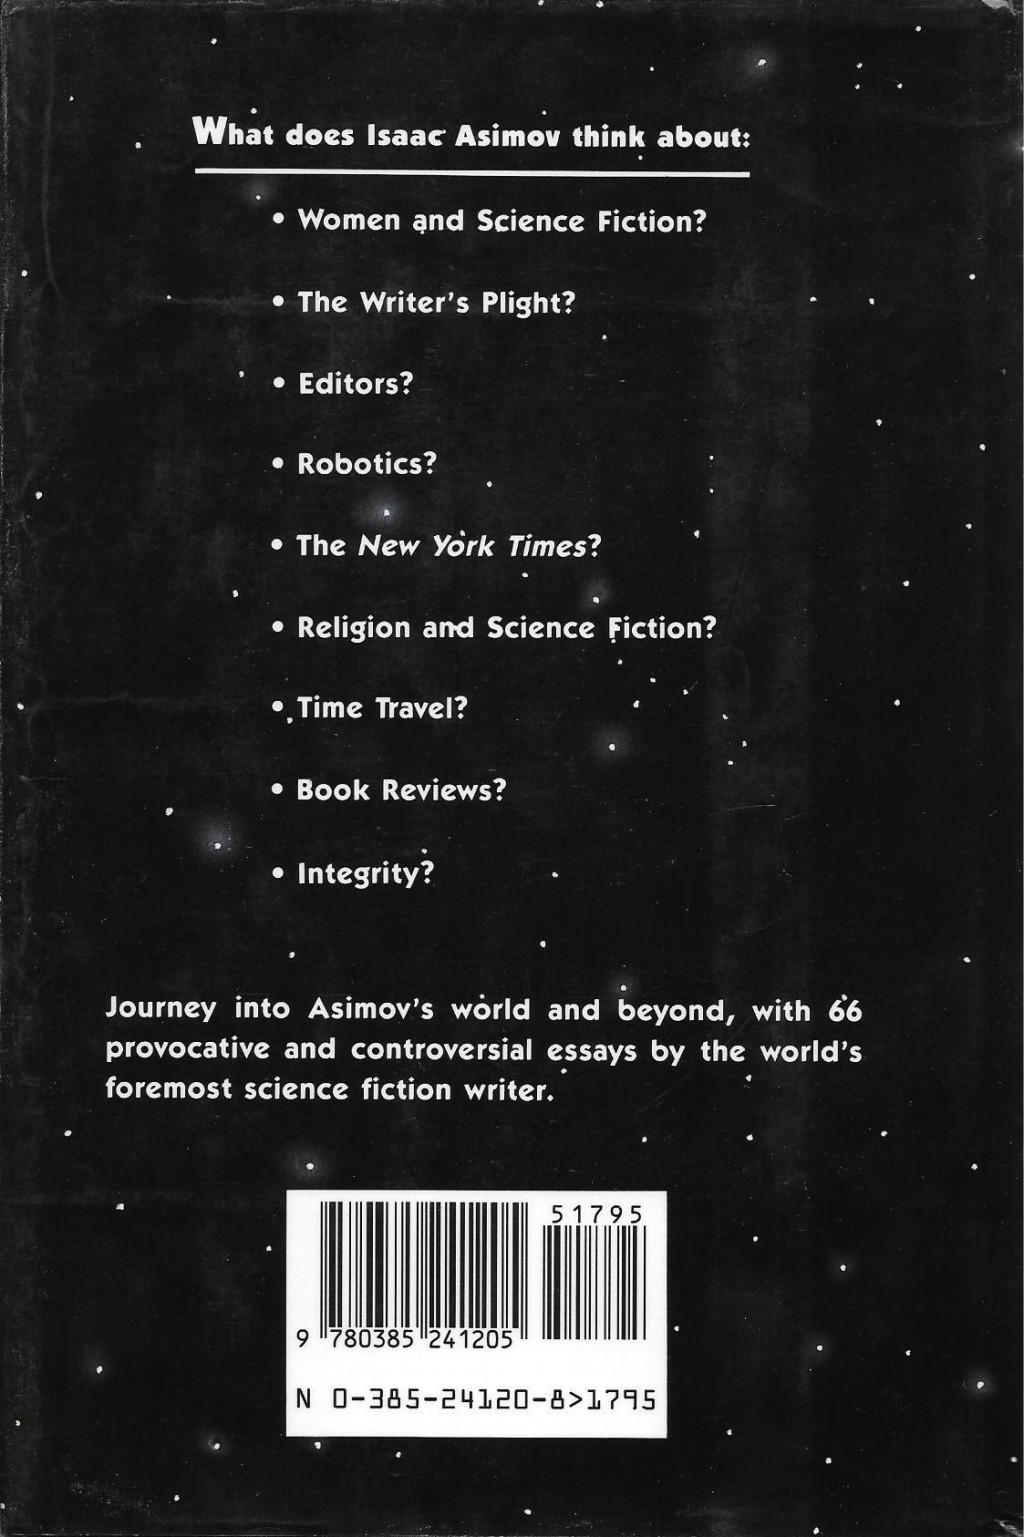 014 Isaac Asimov Essays 71gbytofqyl Essay Awful On Creativity Intelligence Large